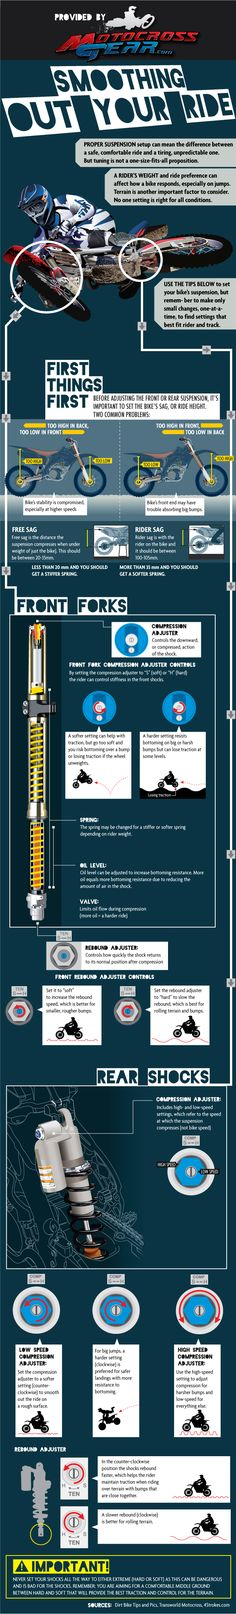 Suspension Setup Guide – Motocross Gear